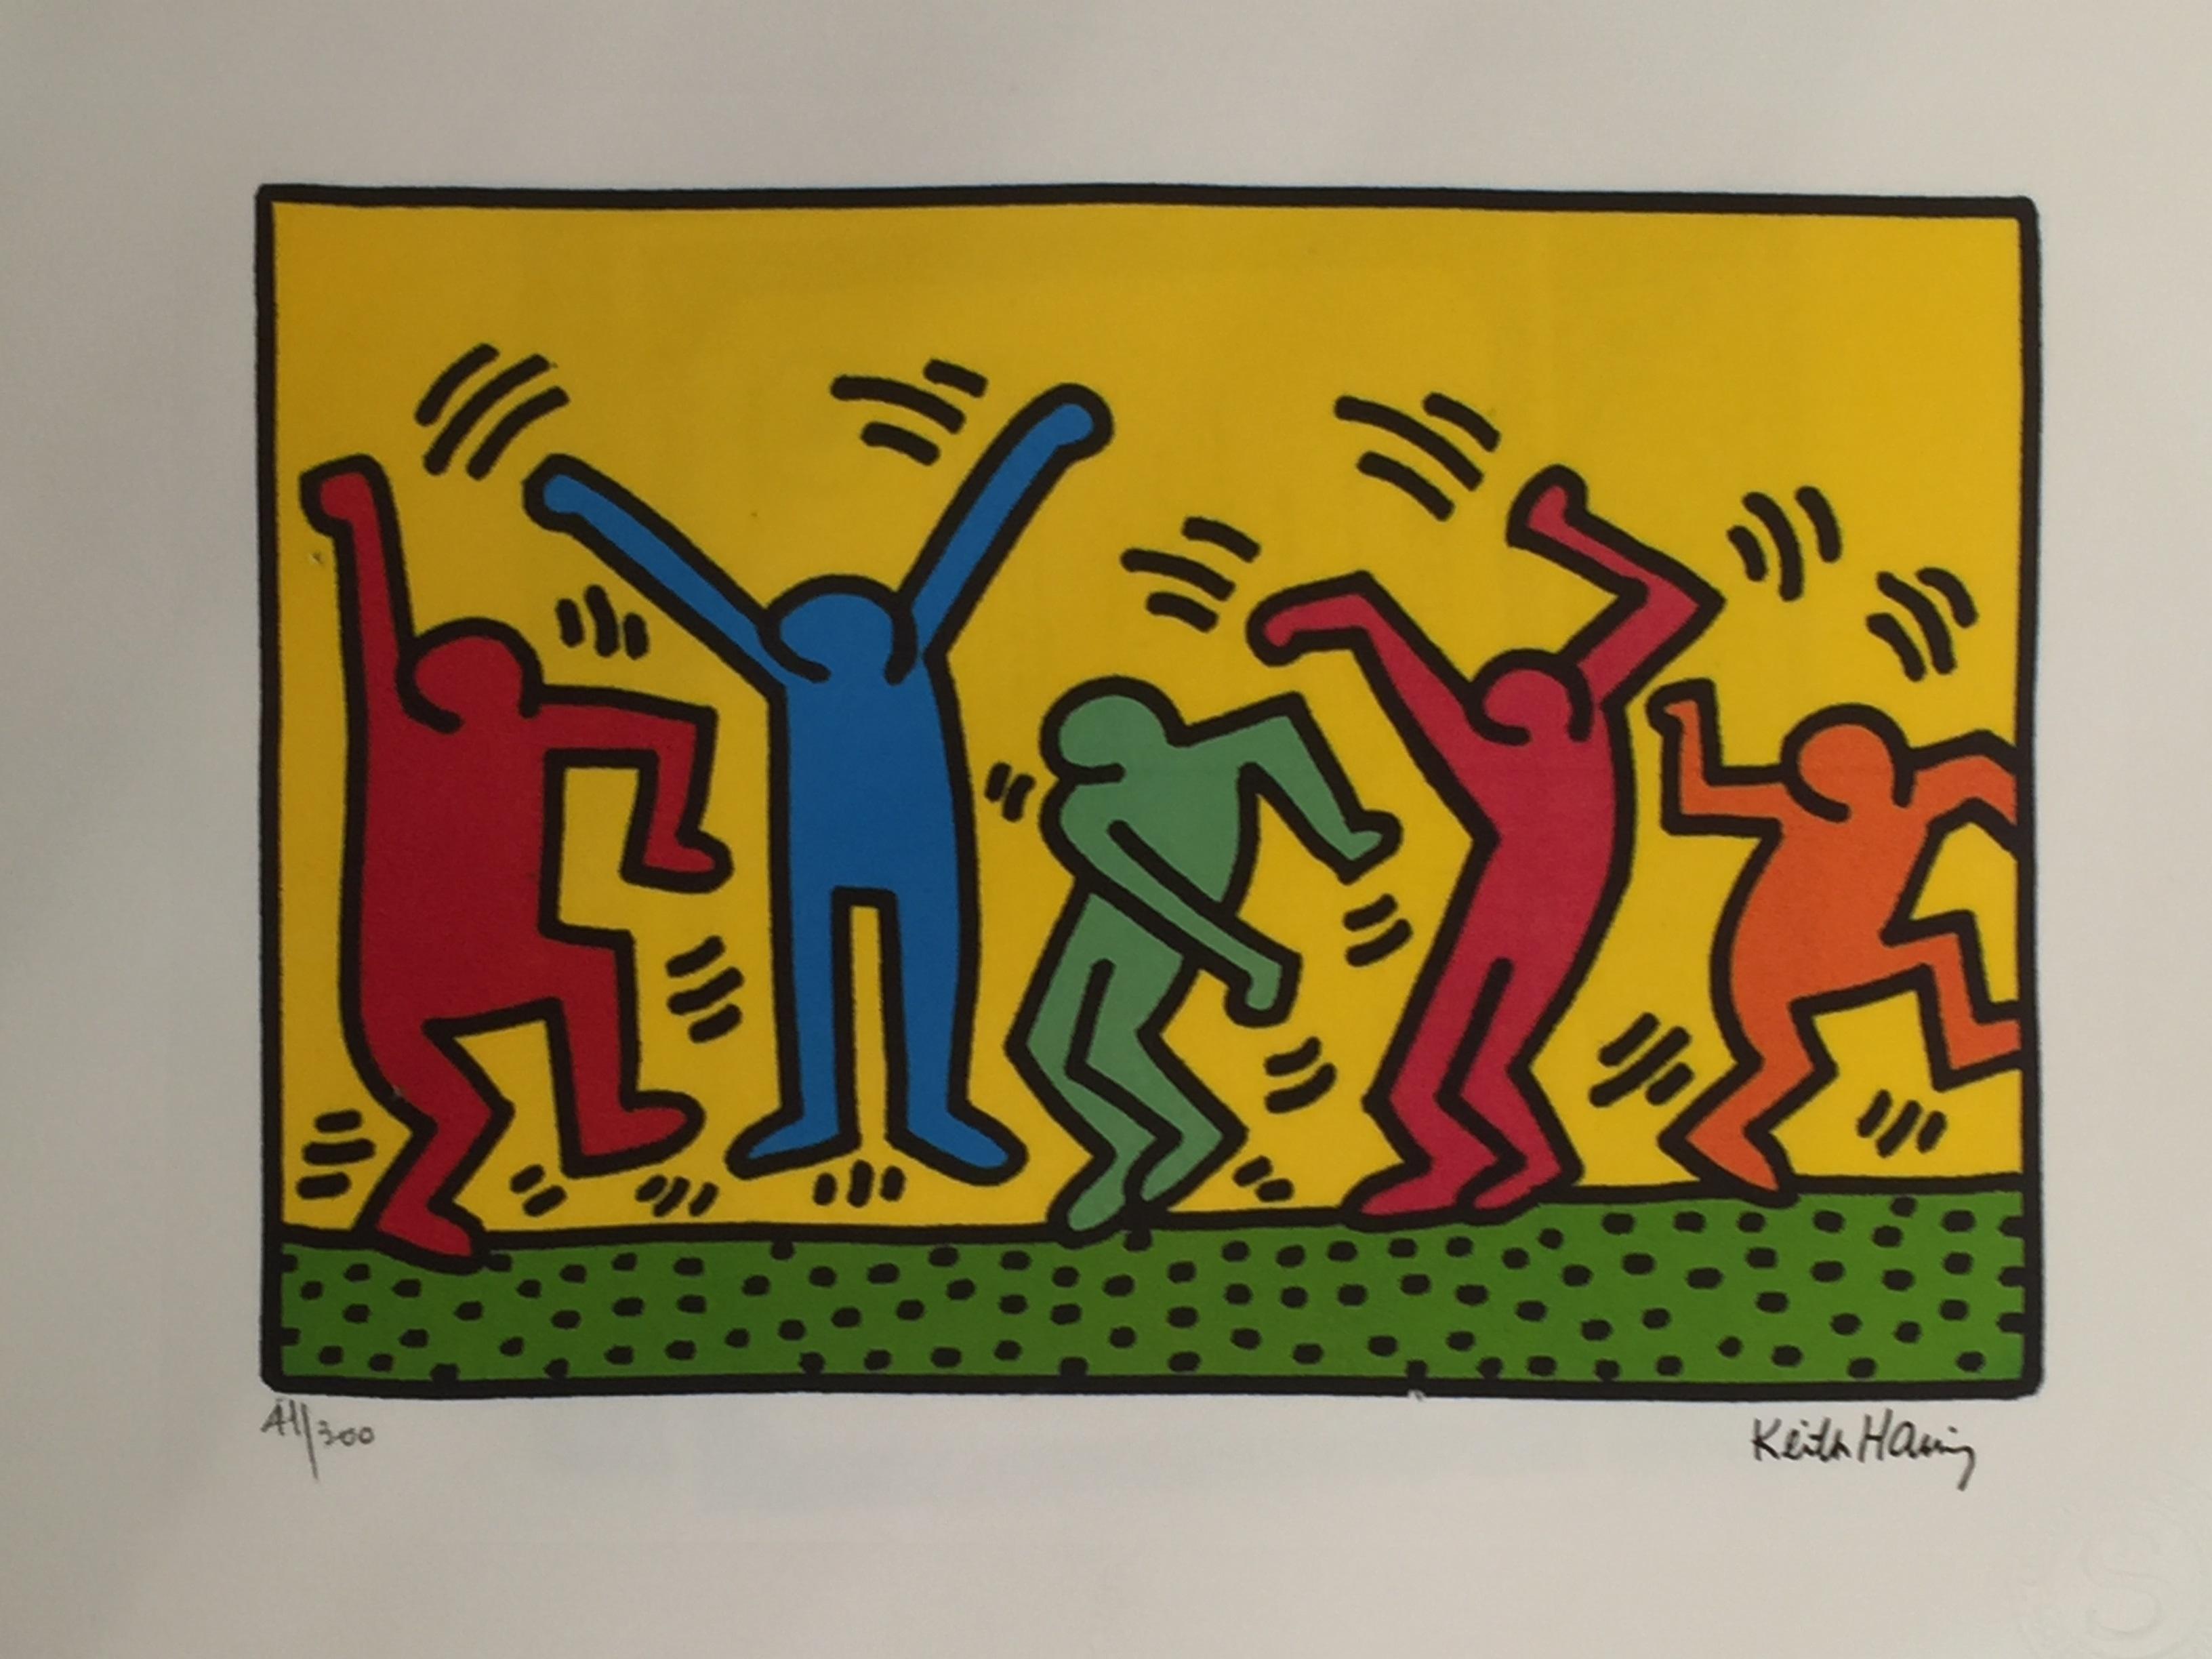 Keith Haring - Figures dancing - Contemporary Art - PrivateLot.com